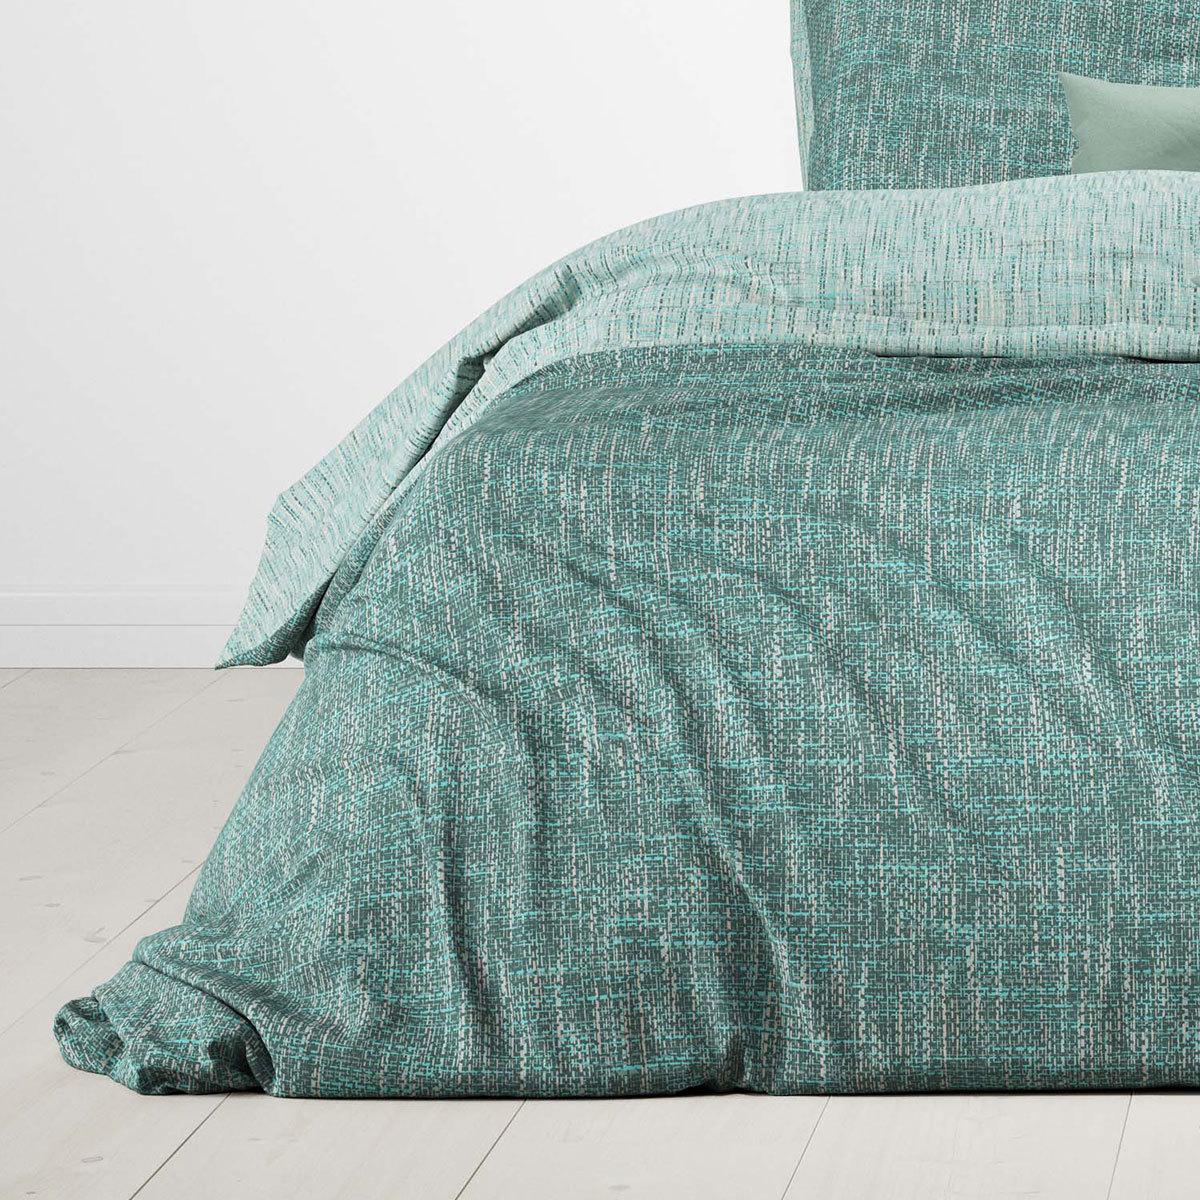 bettwarenshop wendebettw sche albi hellgr n dunkelgr n g nstig online kaufen bei bettwaren shop. Black Bedroom Furniture Sets. Home Design Ideas